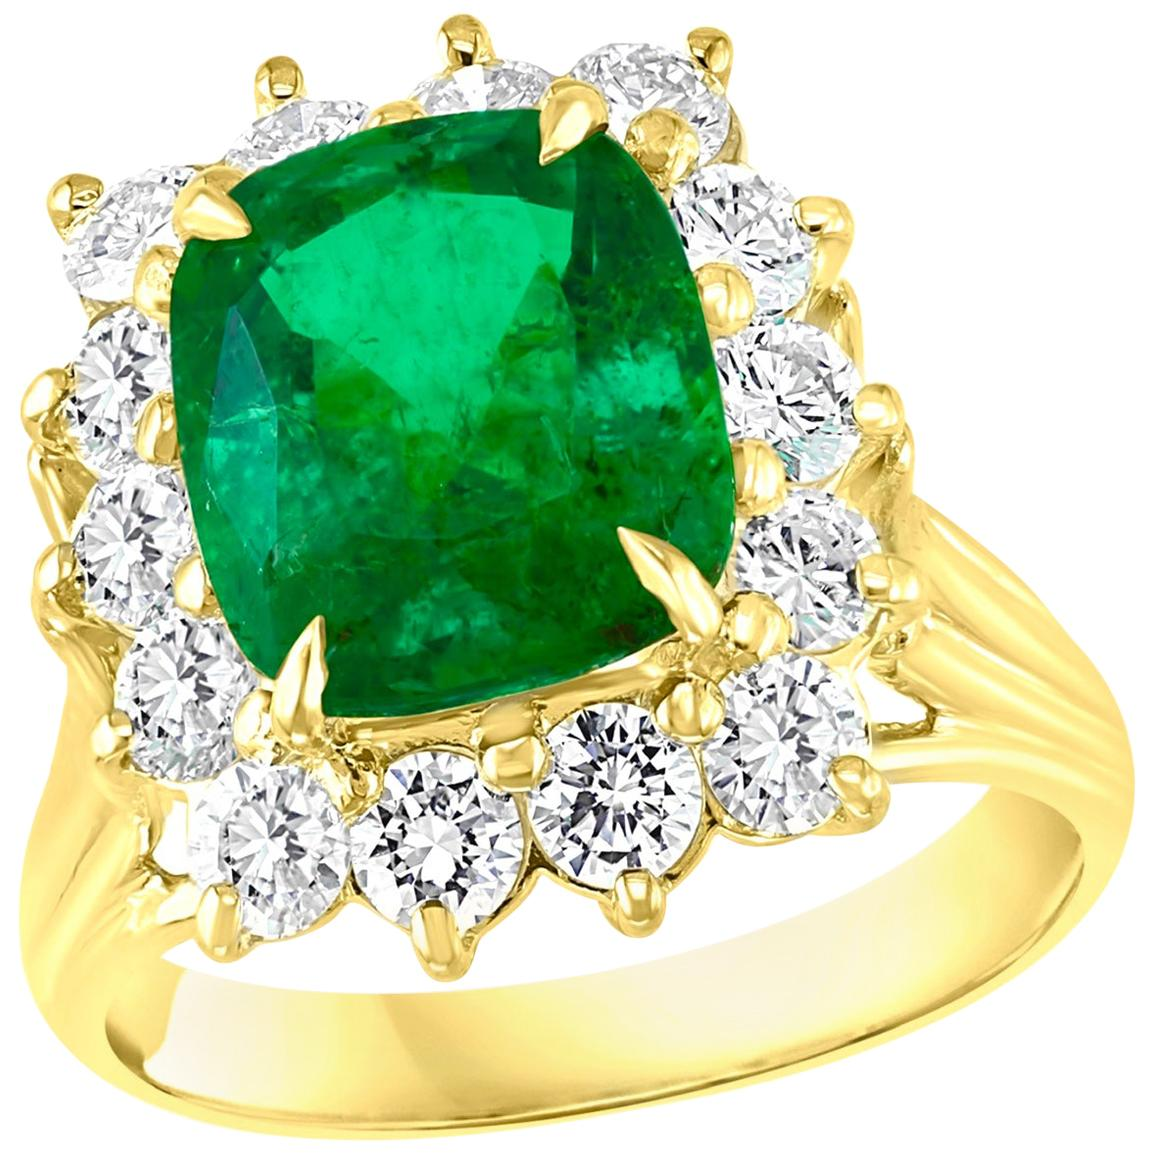 AGL Certified 4.2 Carat Cushion Cut Colombian Emerald & Diamond Ring 18K Y Gold